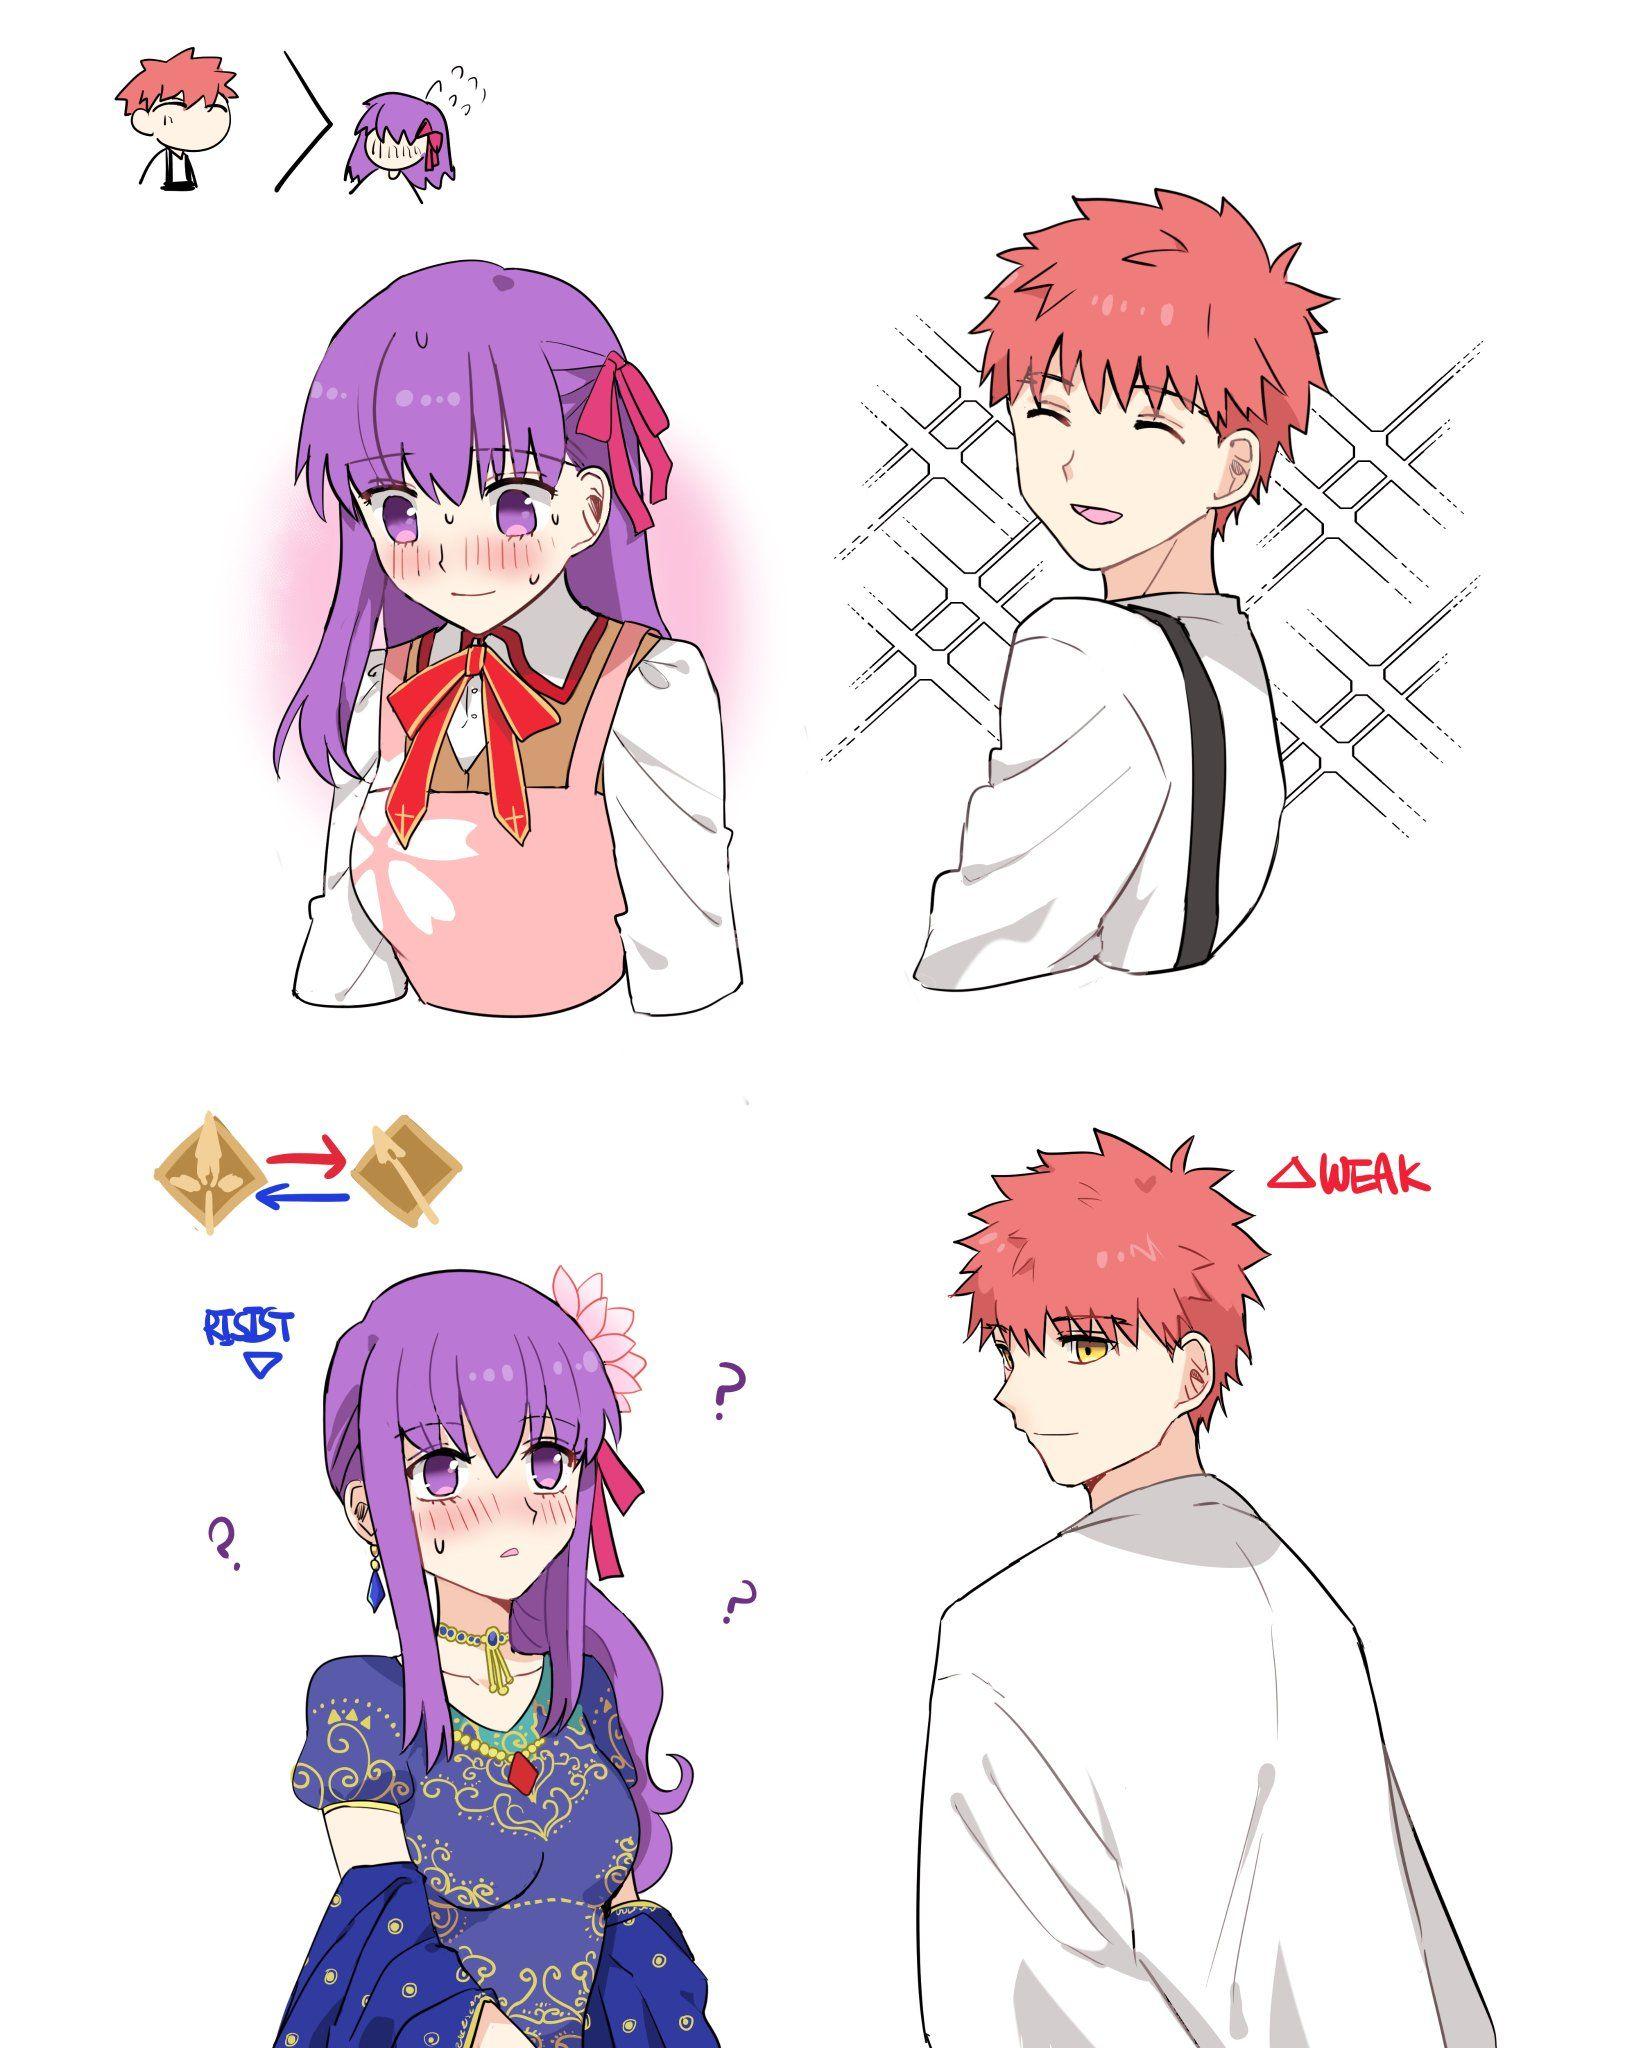 Twitter 2020 캐릭터 일러스트, 일본 애니메이션